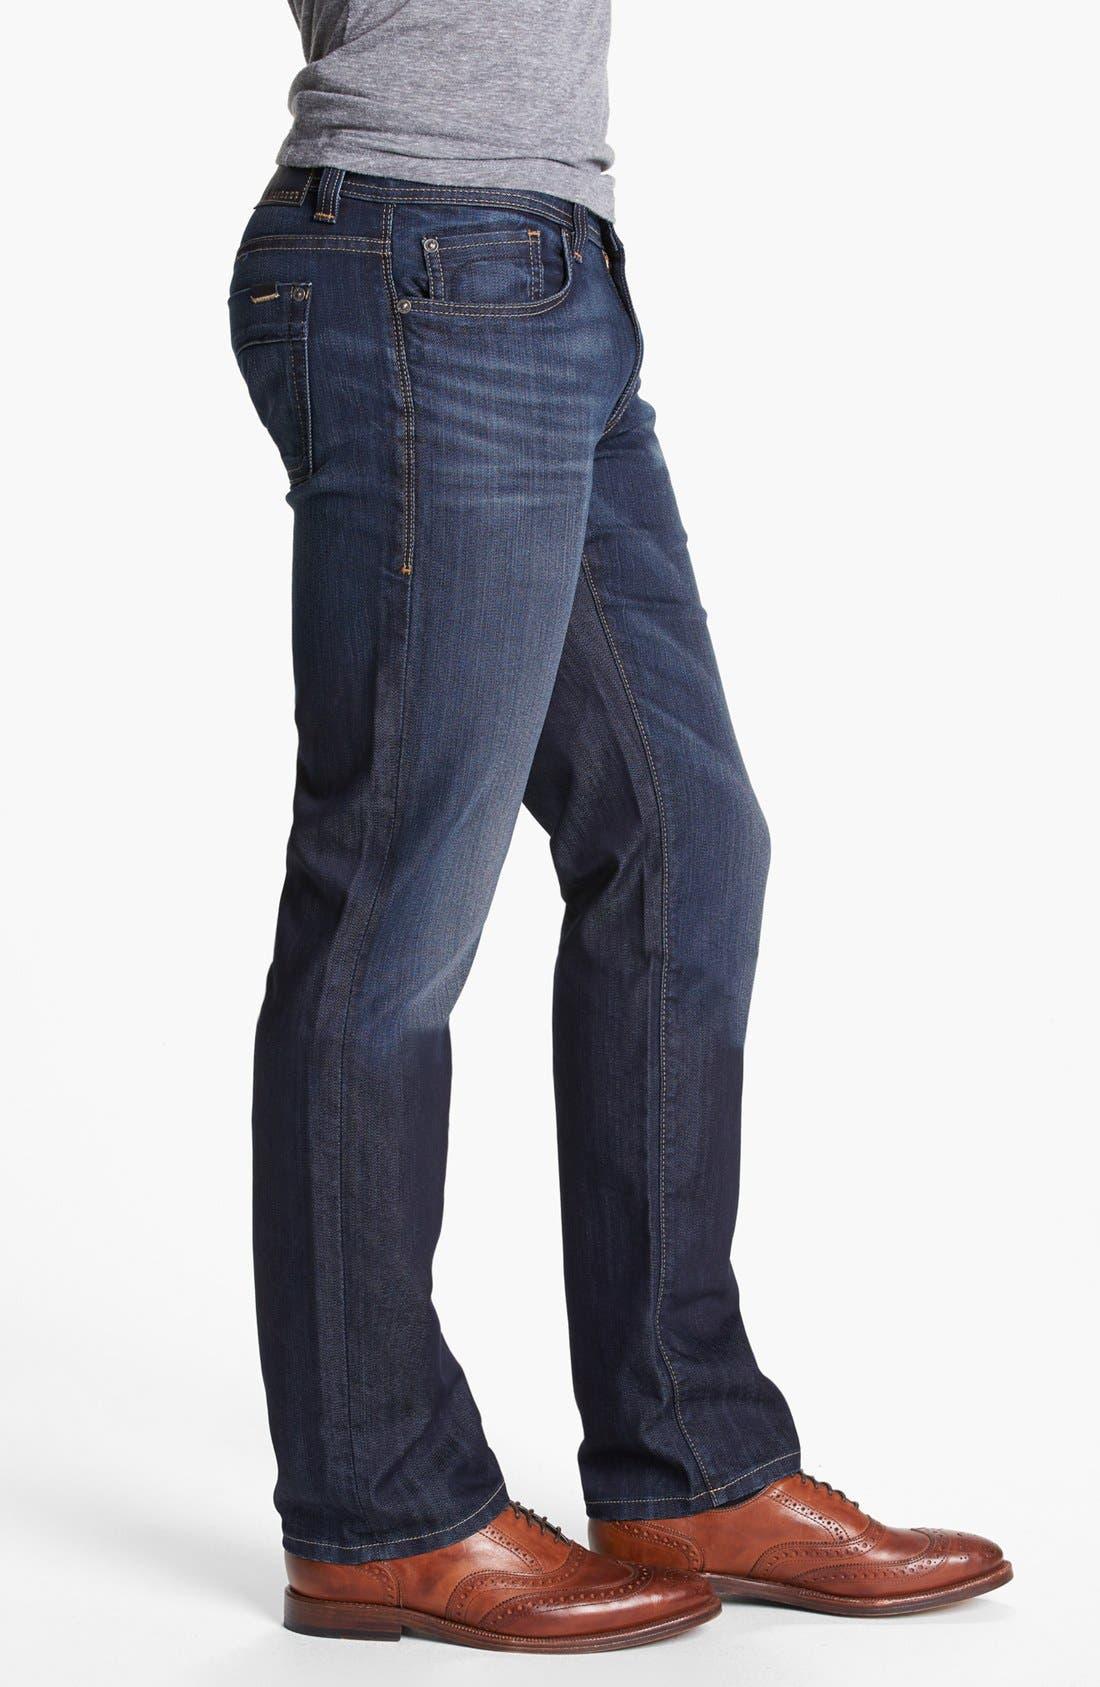 Alternate Image 3  - Fidelity Denim 'Slim Jim' Slim Fit Jeans (Trigger Dark) (Tall)